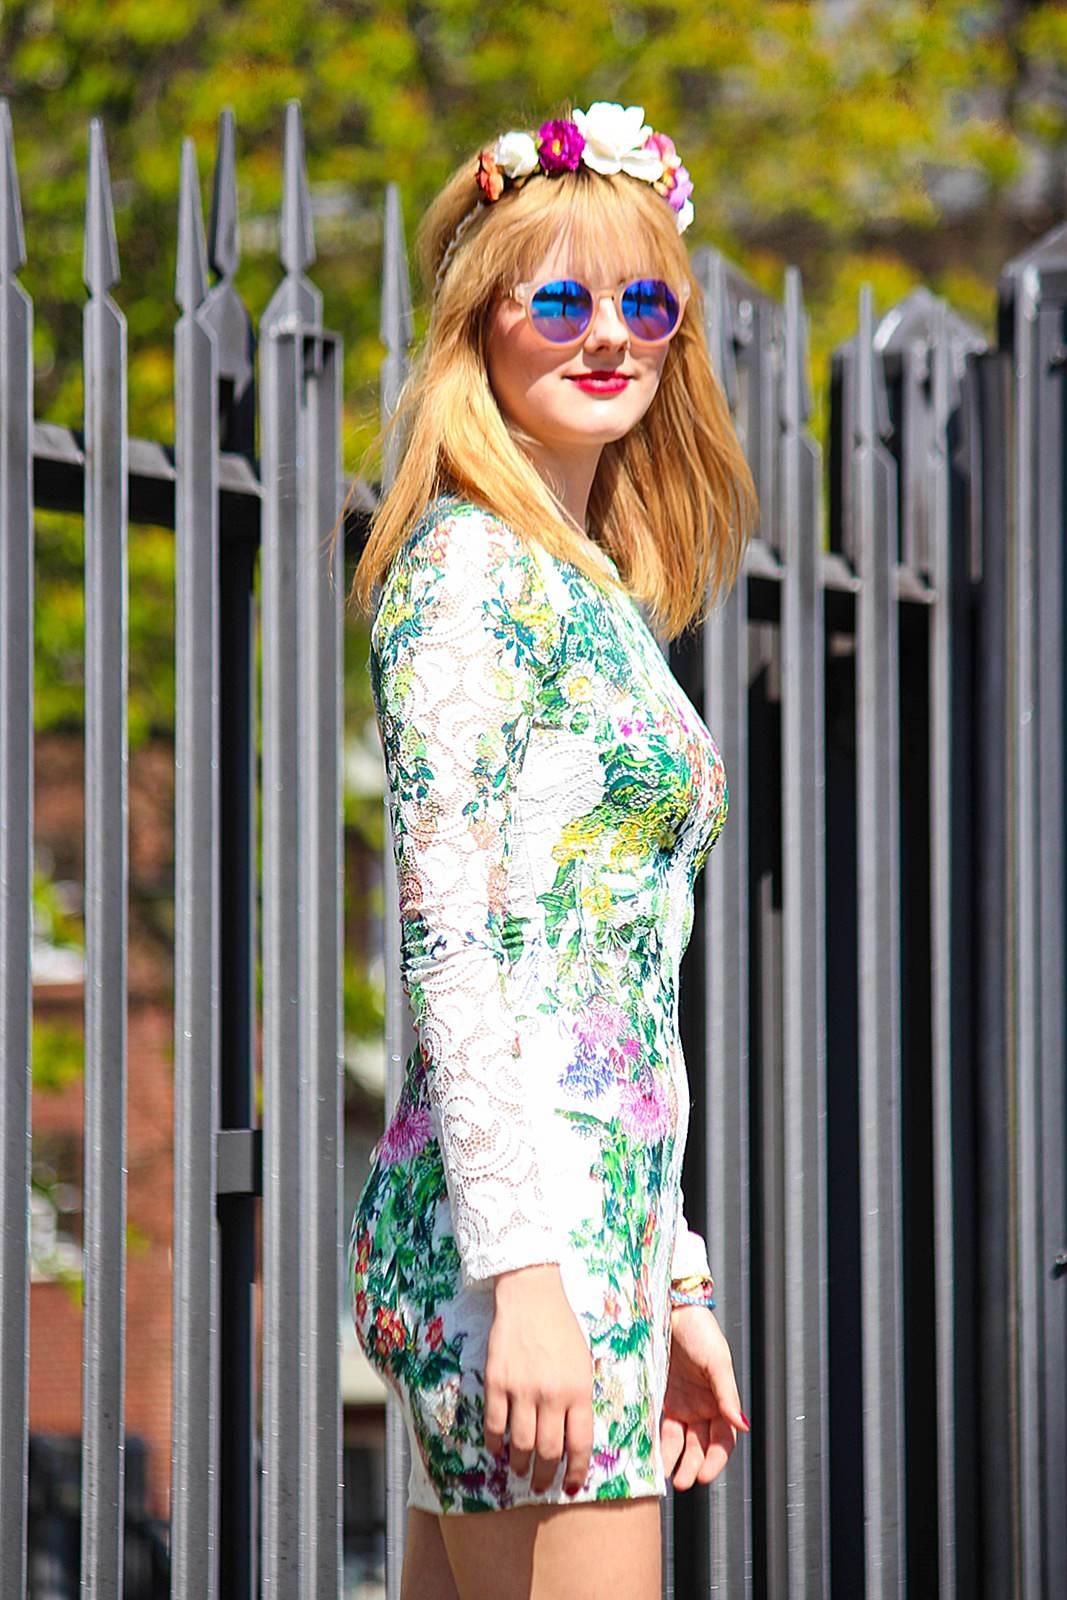 Des Belles Choses_Fashionblog Cologne_Forever 21 Flower Dress 2